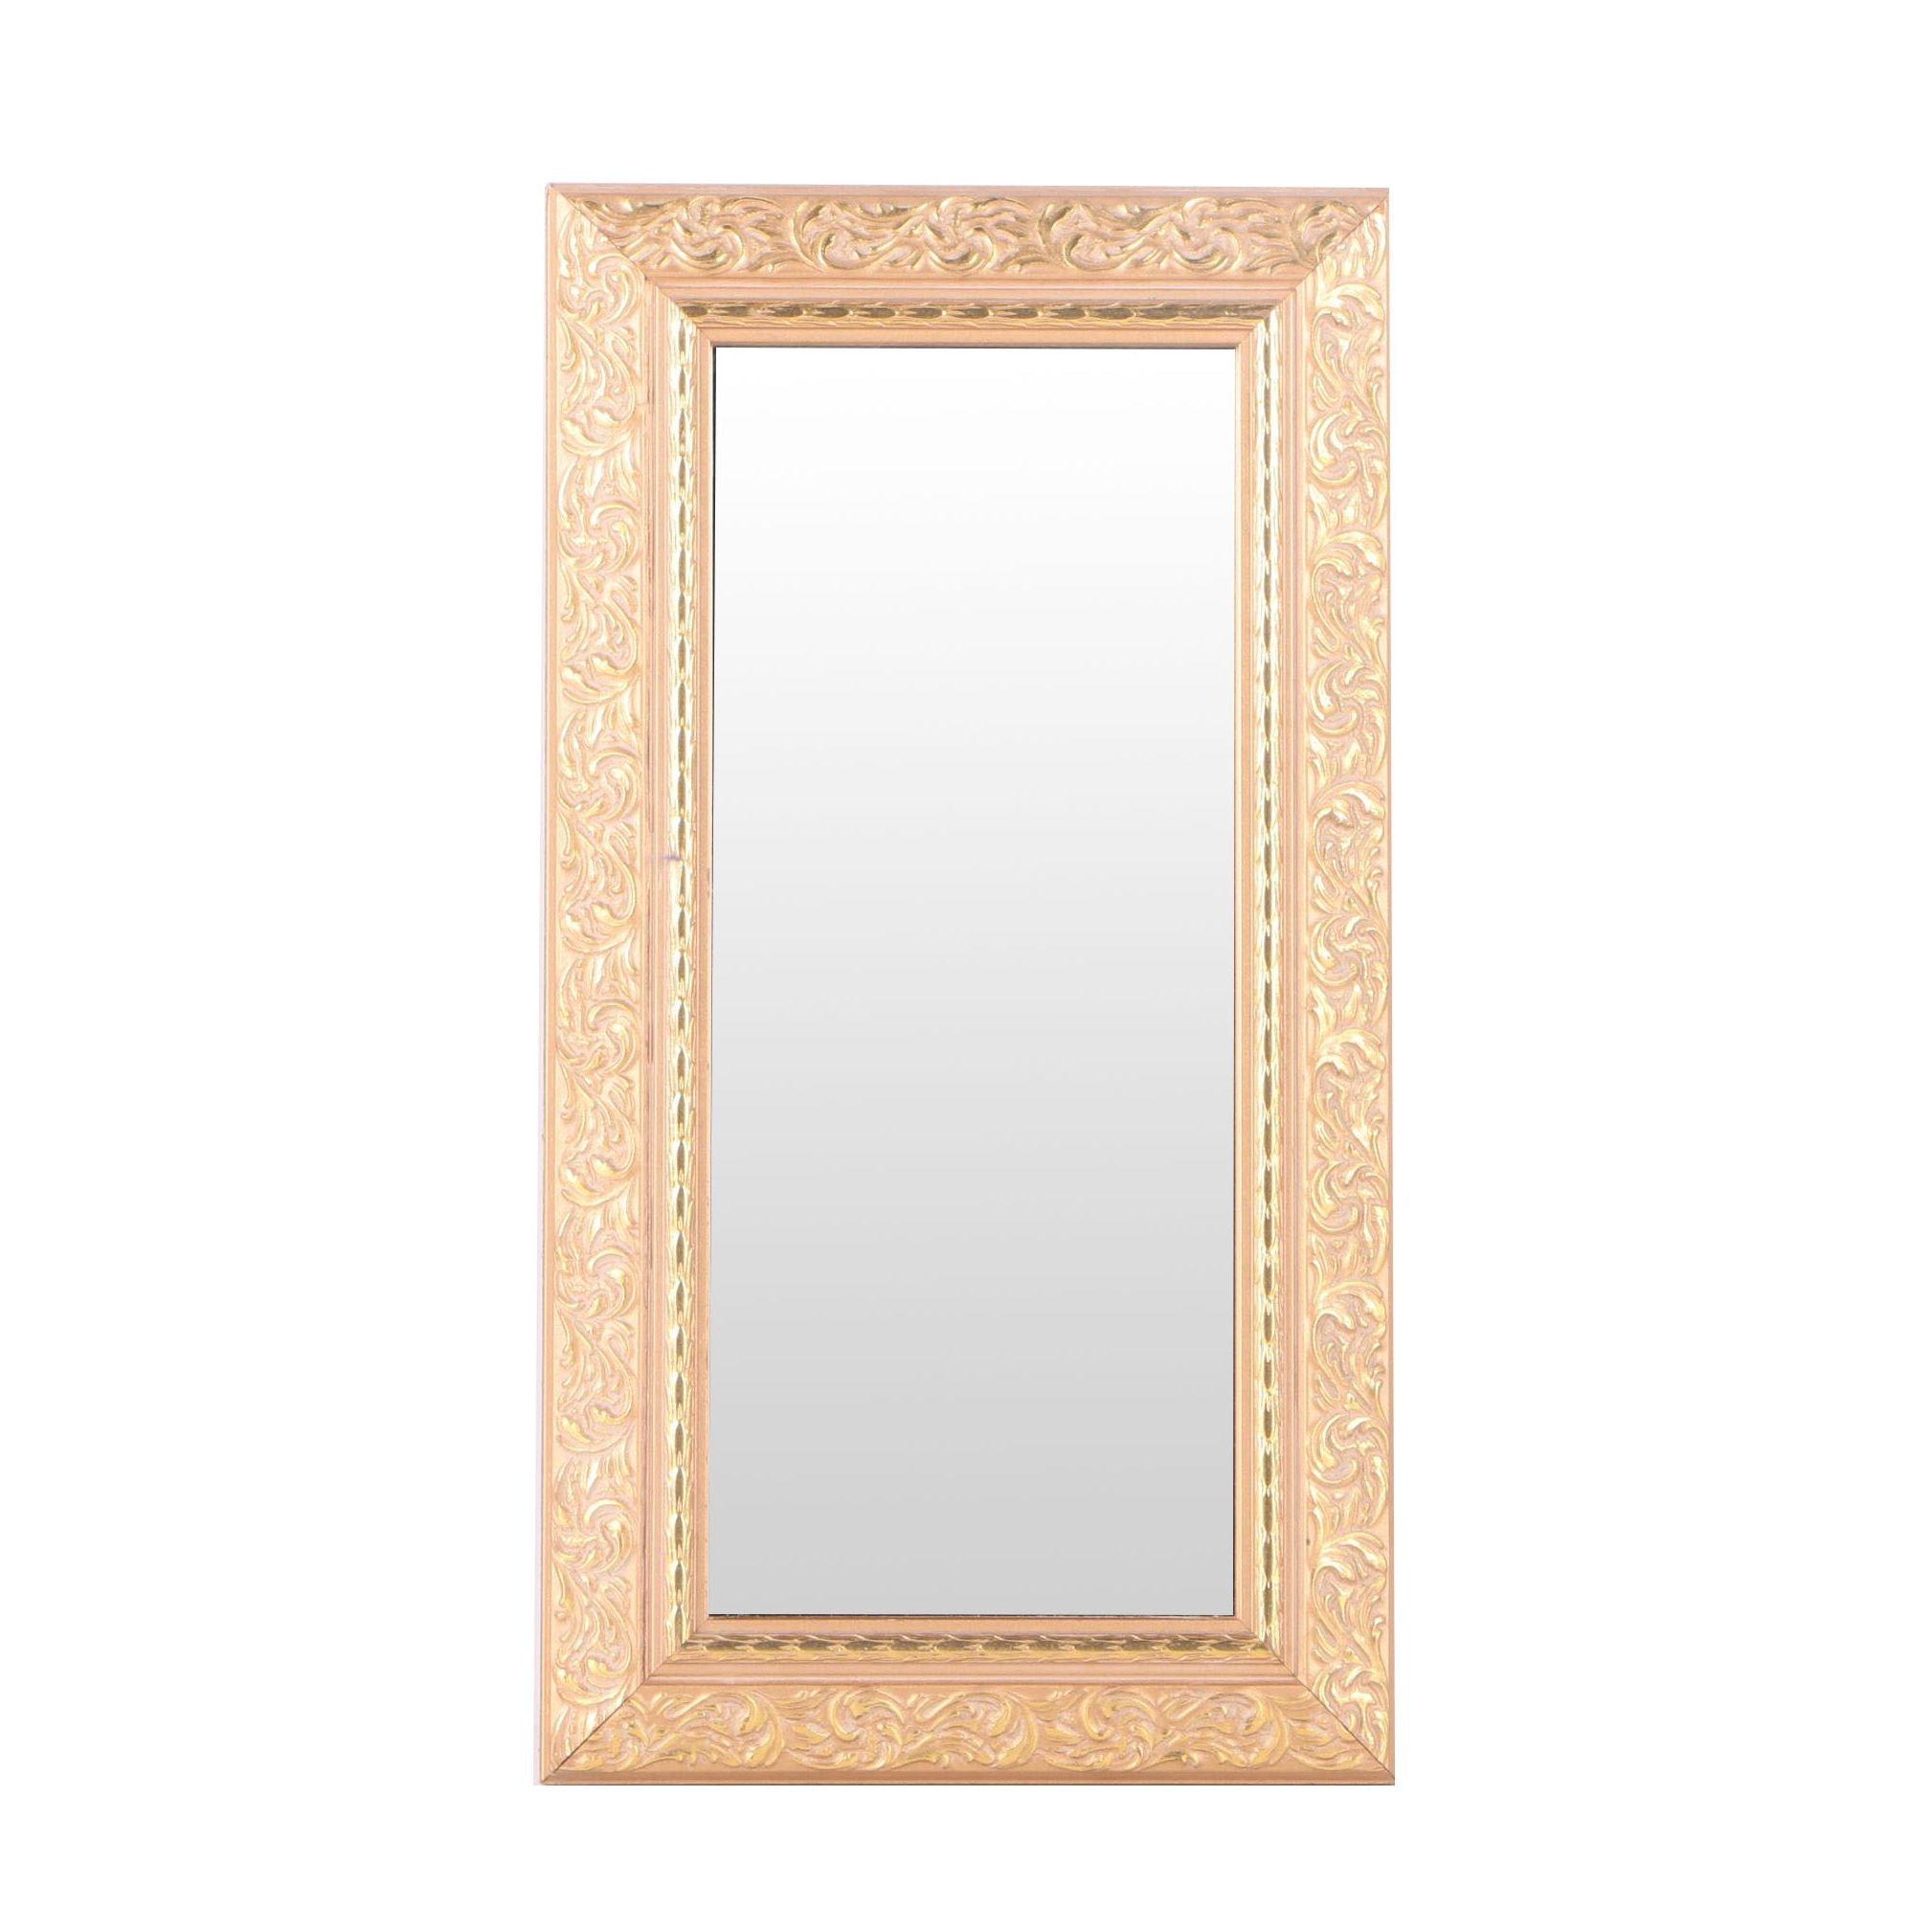 Randomlane Rectangular Decorative Wall Mirror